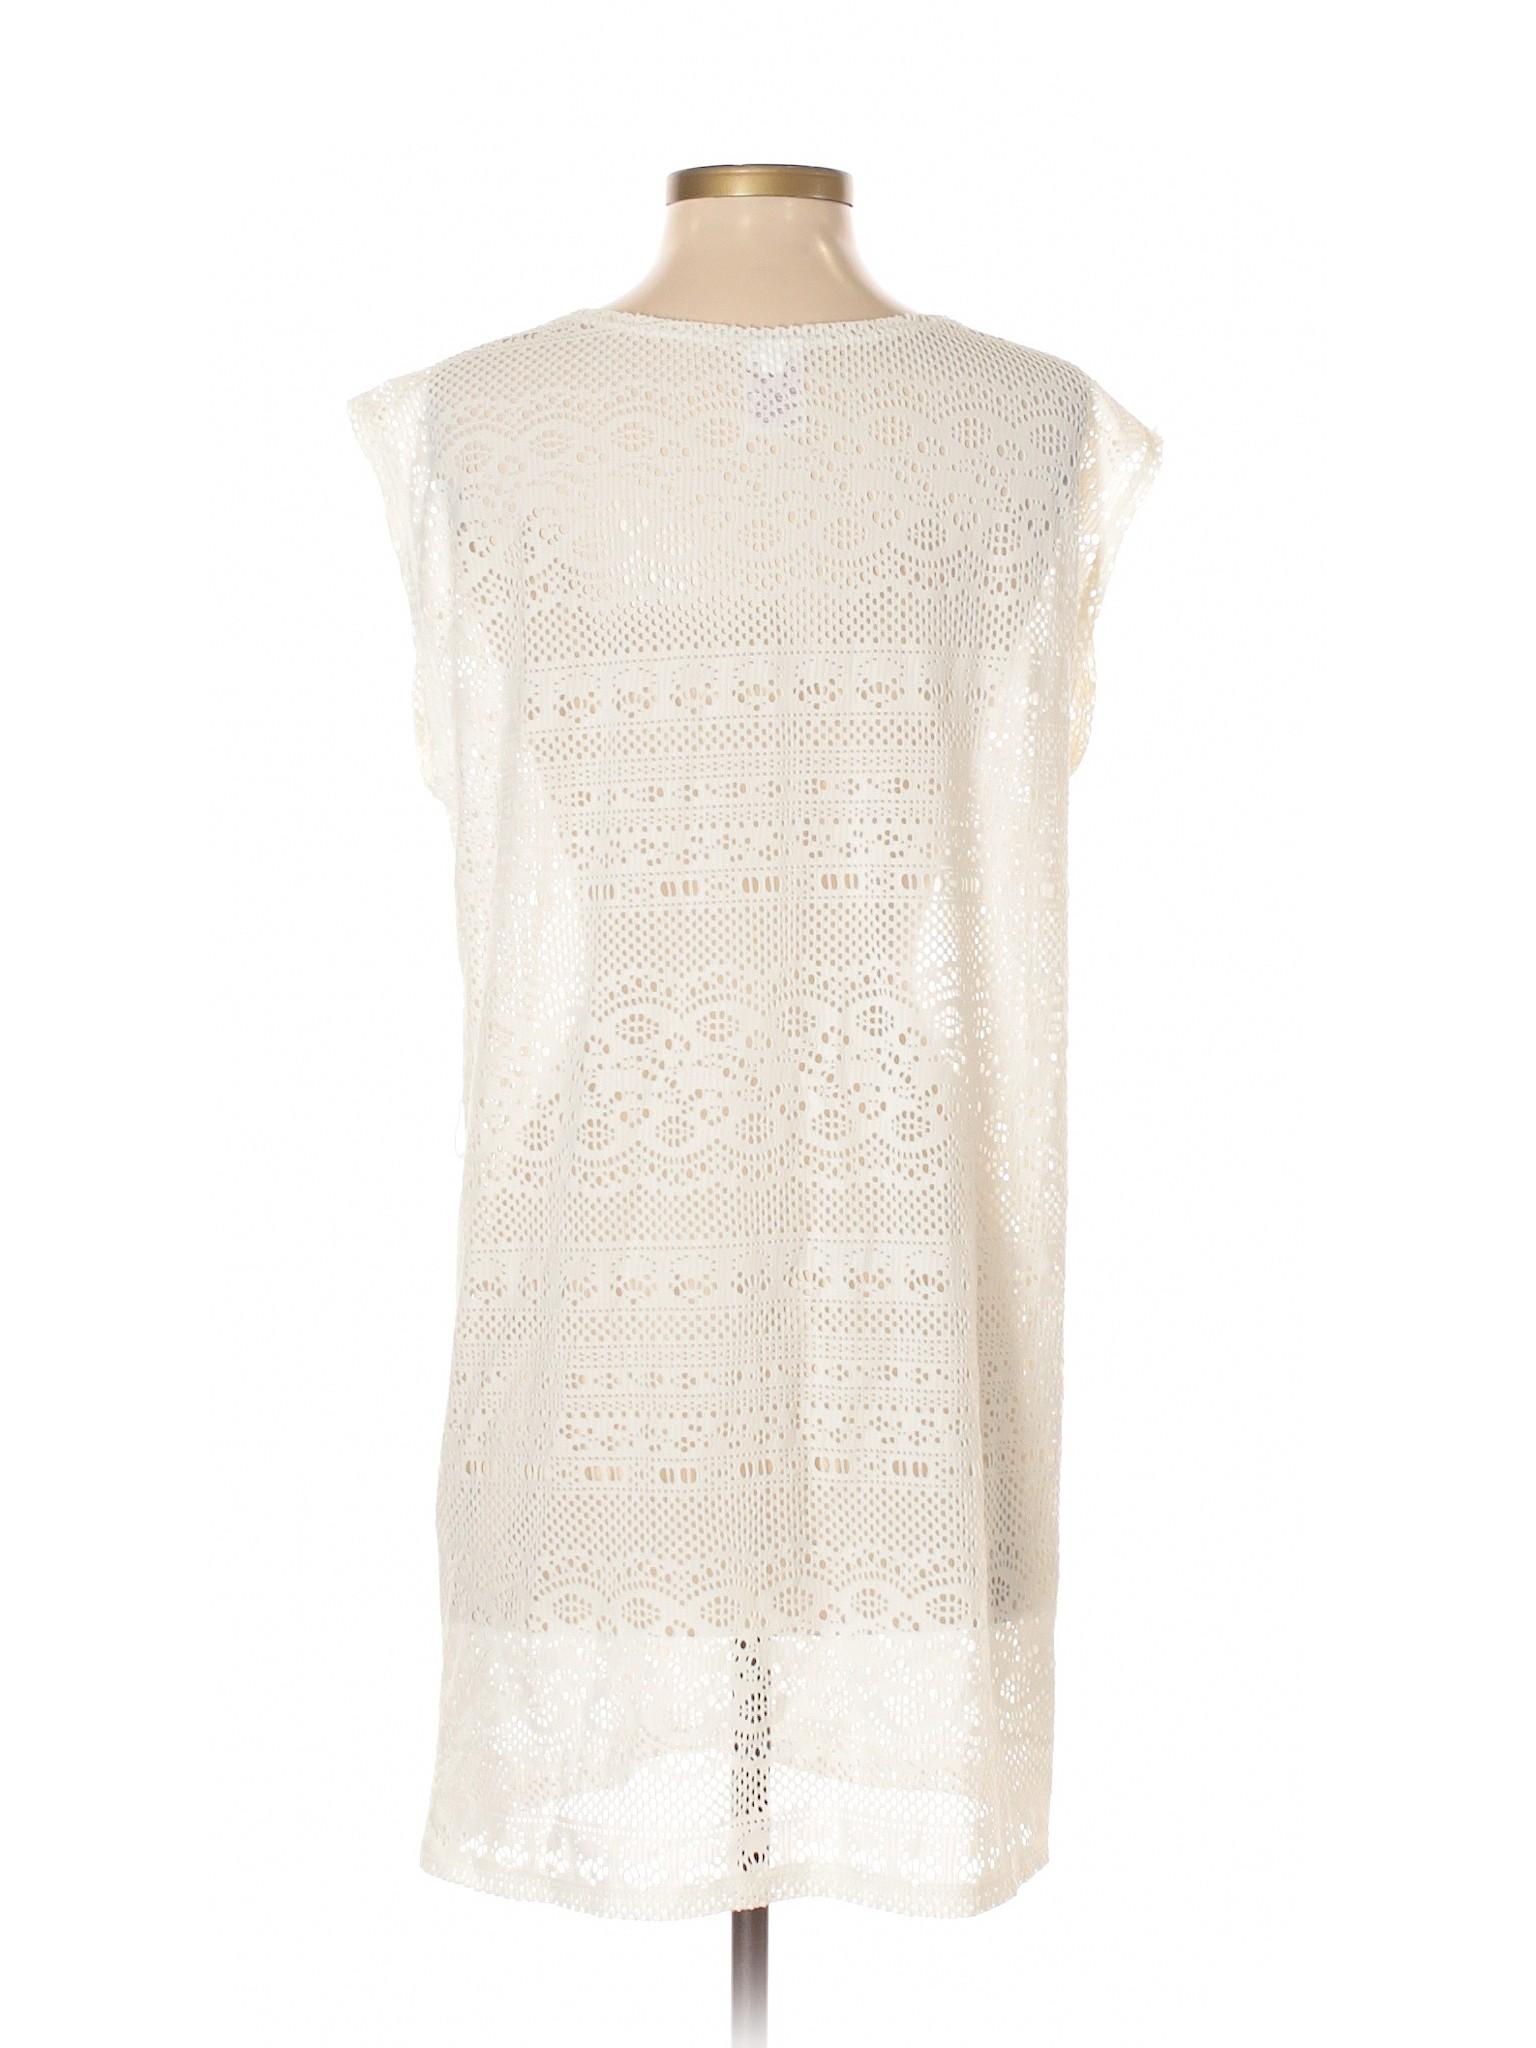 Selling Dress Selling Selling Merona Merona Merona Casual Dress Casual rwva8Xrq